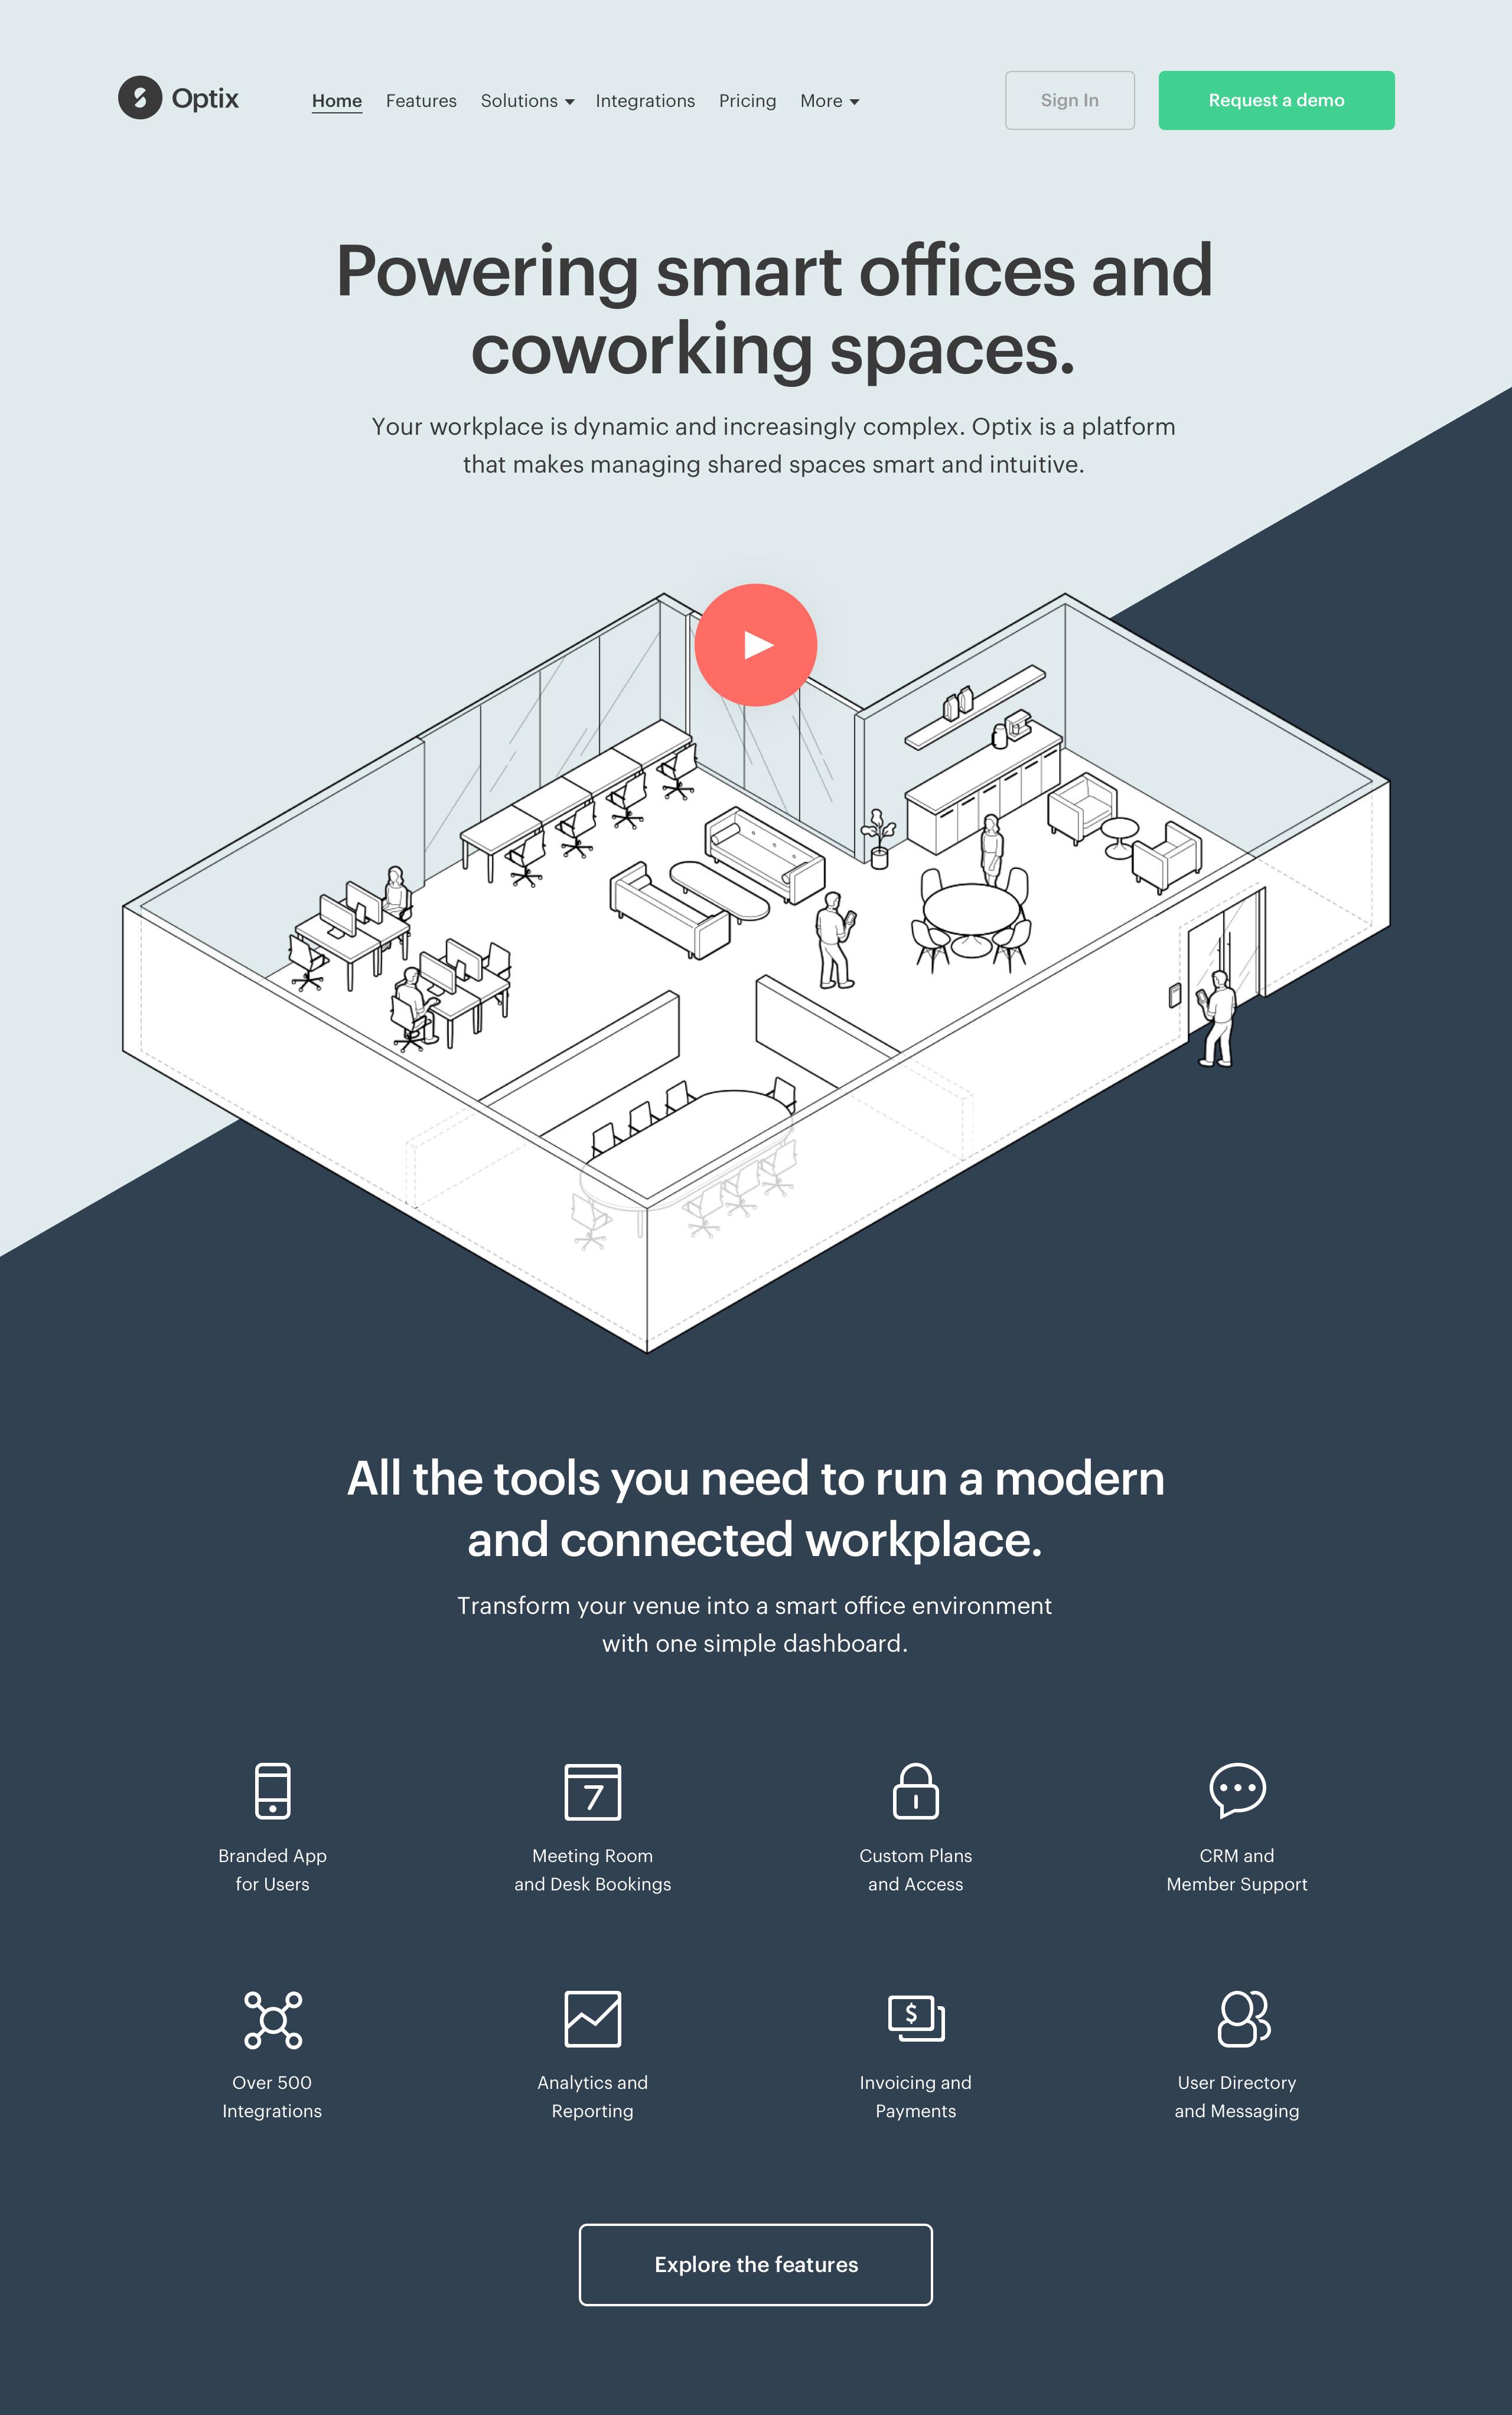 Optix marketing website - Homepage